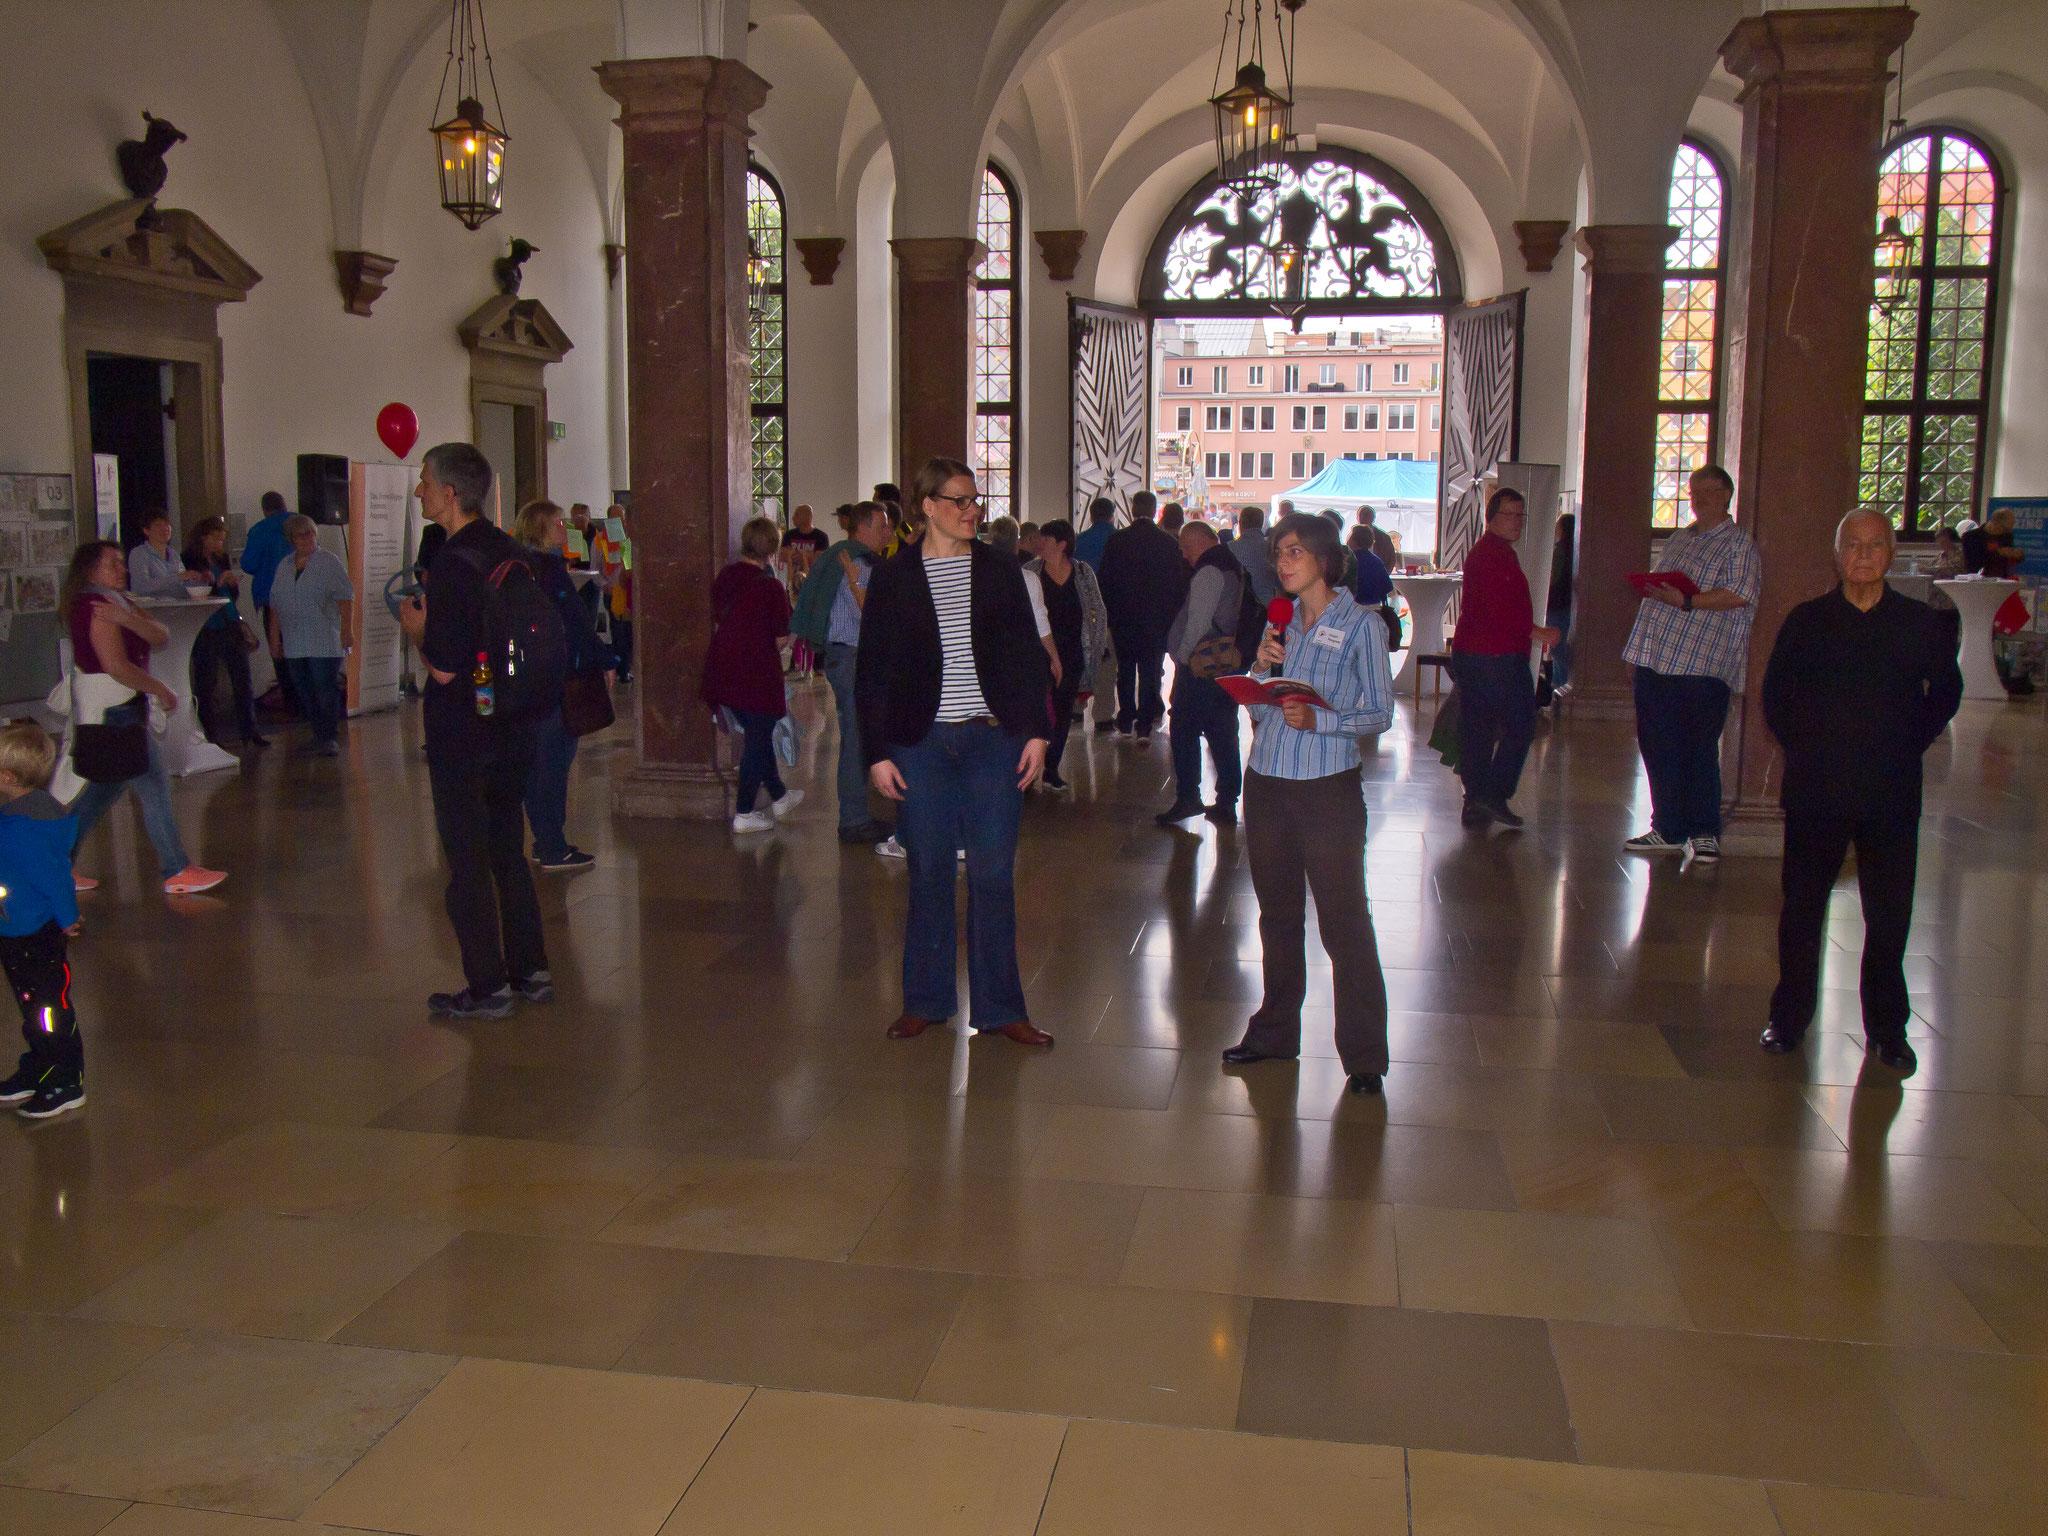 4. Augsburger Freiwilligen-Messe 2017 - Foto: Robert Hösle